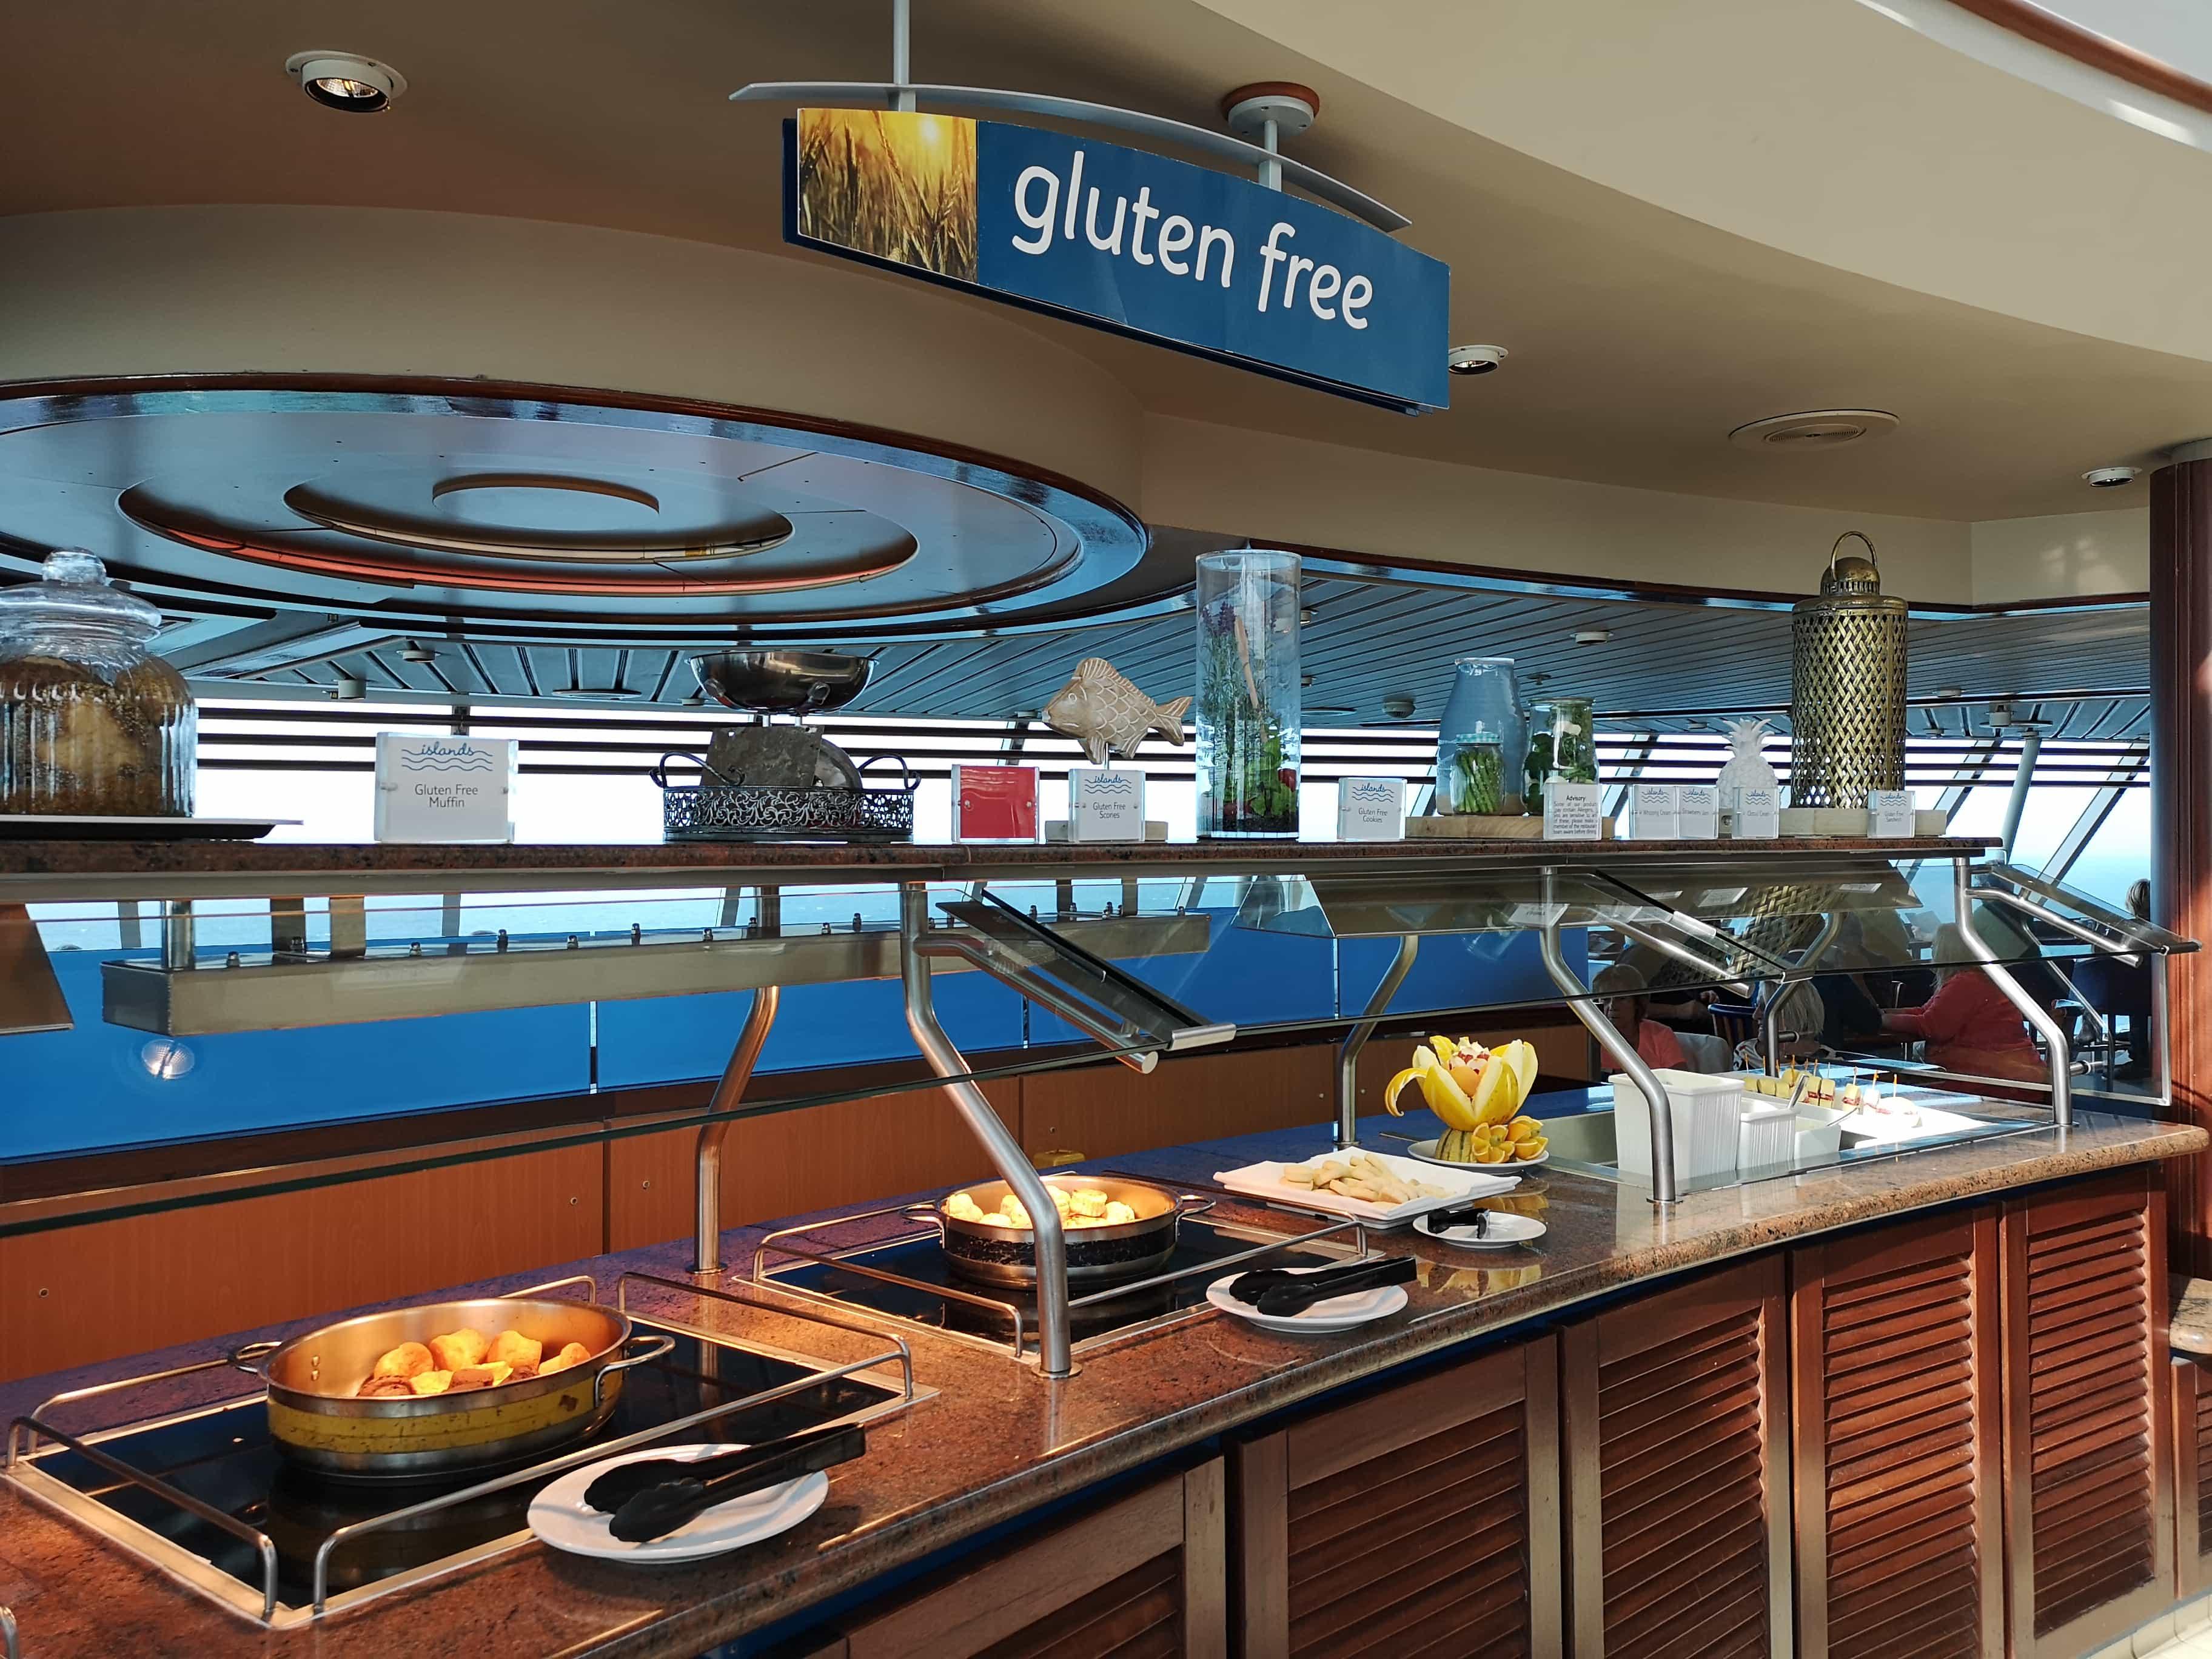 Marella Discovery Buffet Gluten Free